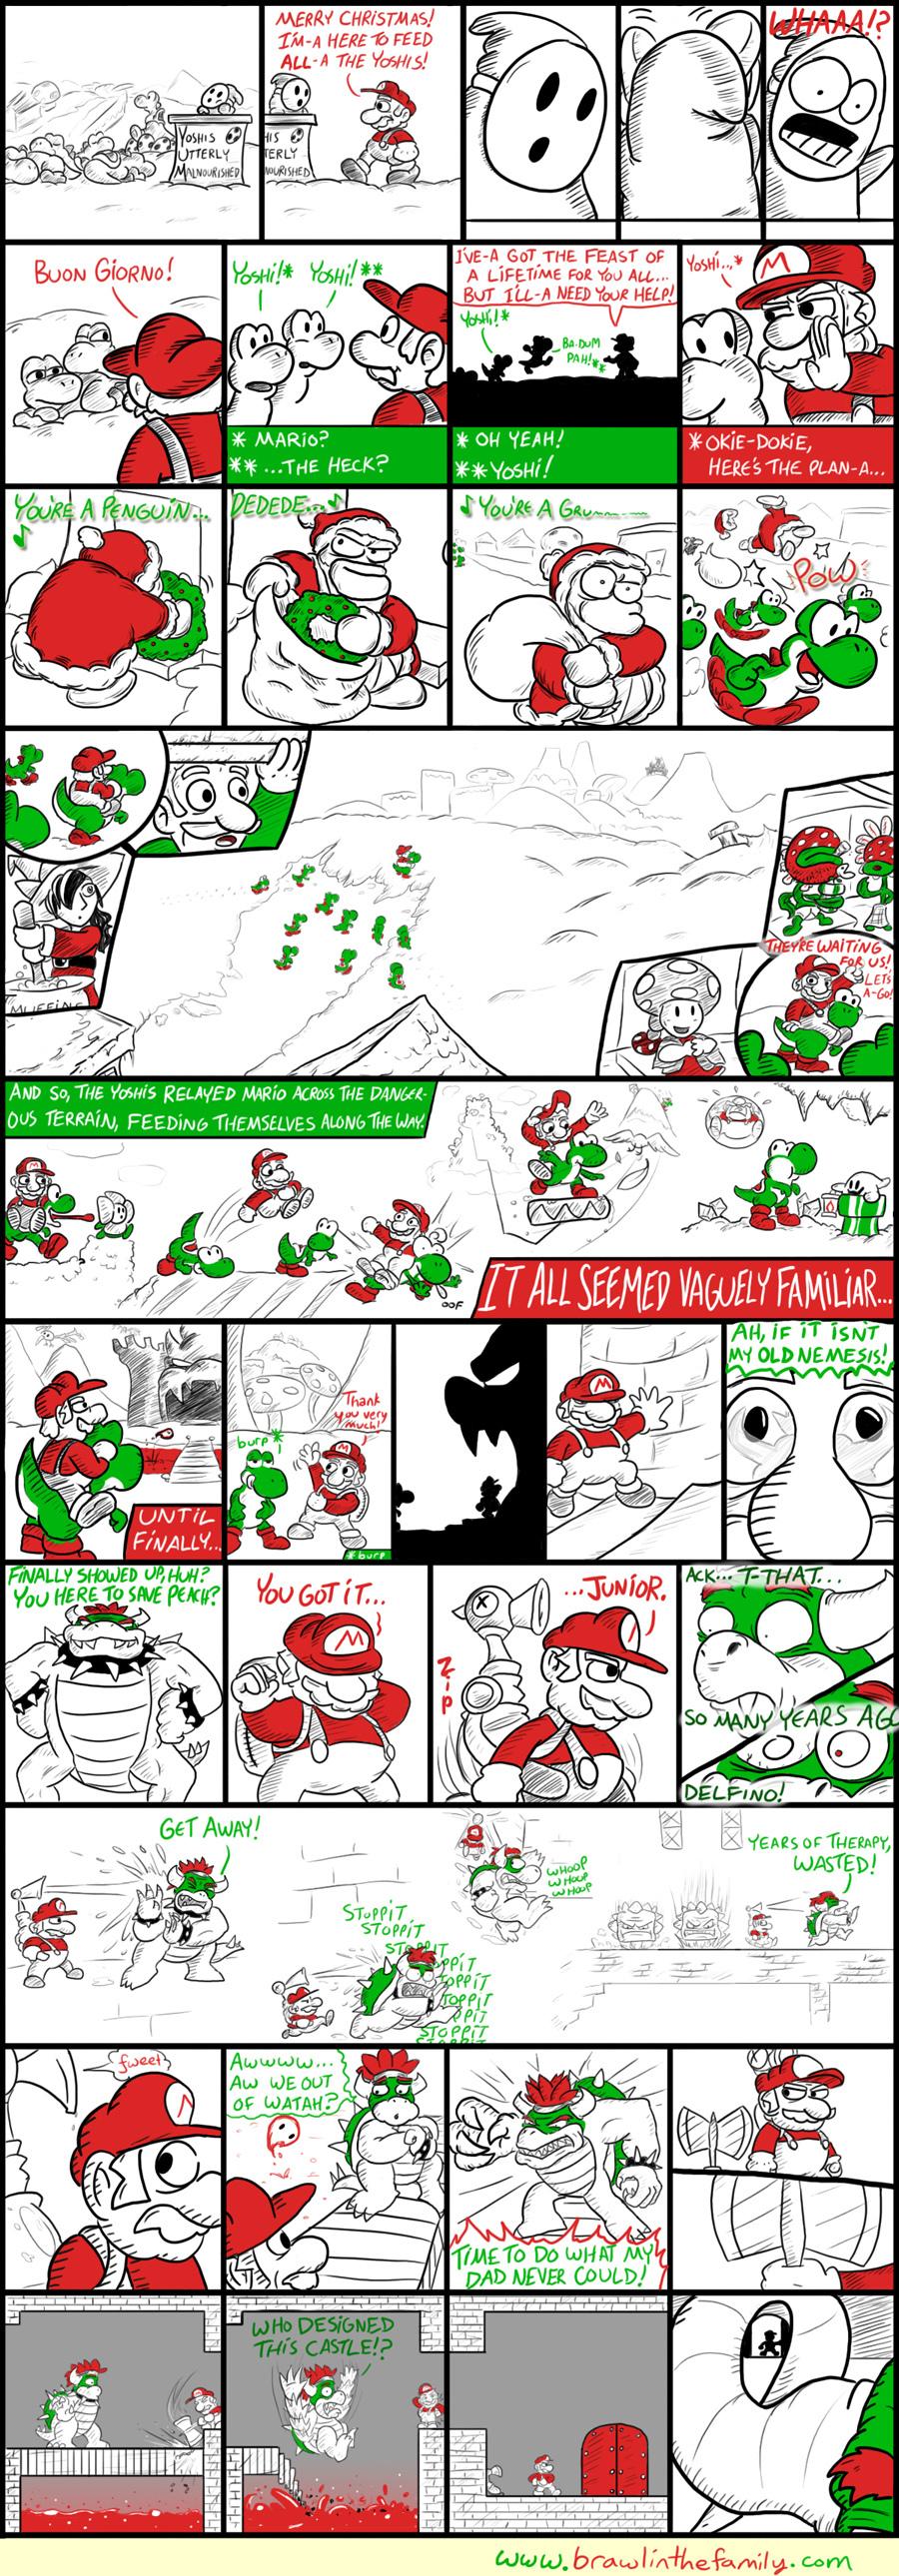 207 – A Mushroom Kingdom Carol (Part 7)